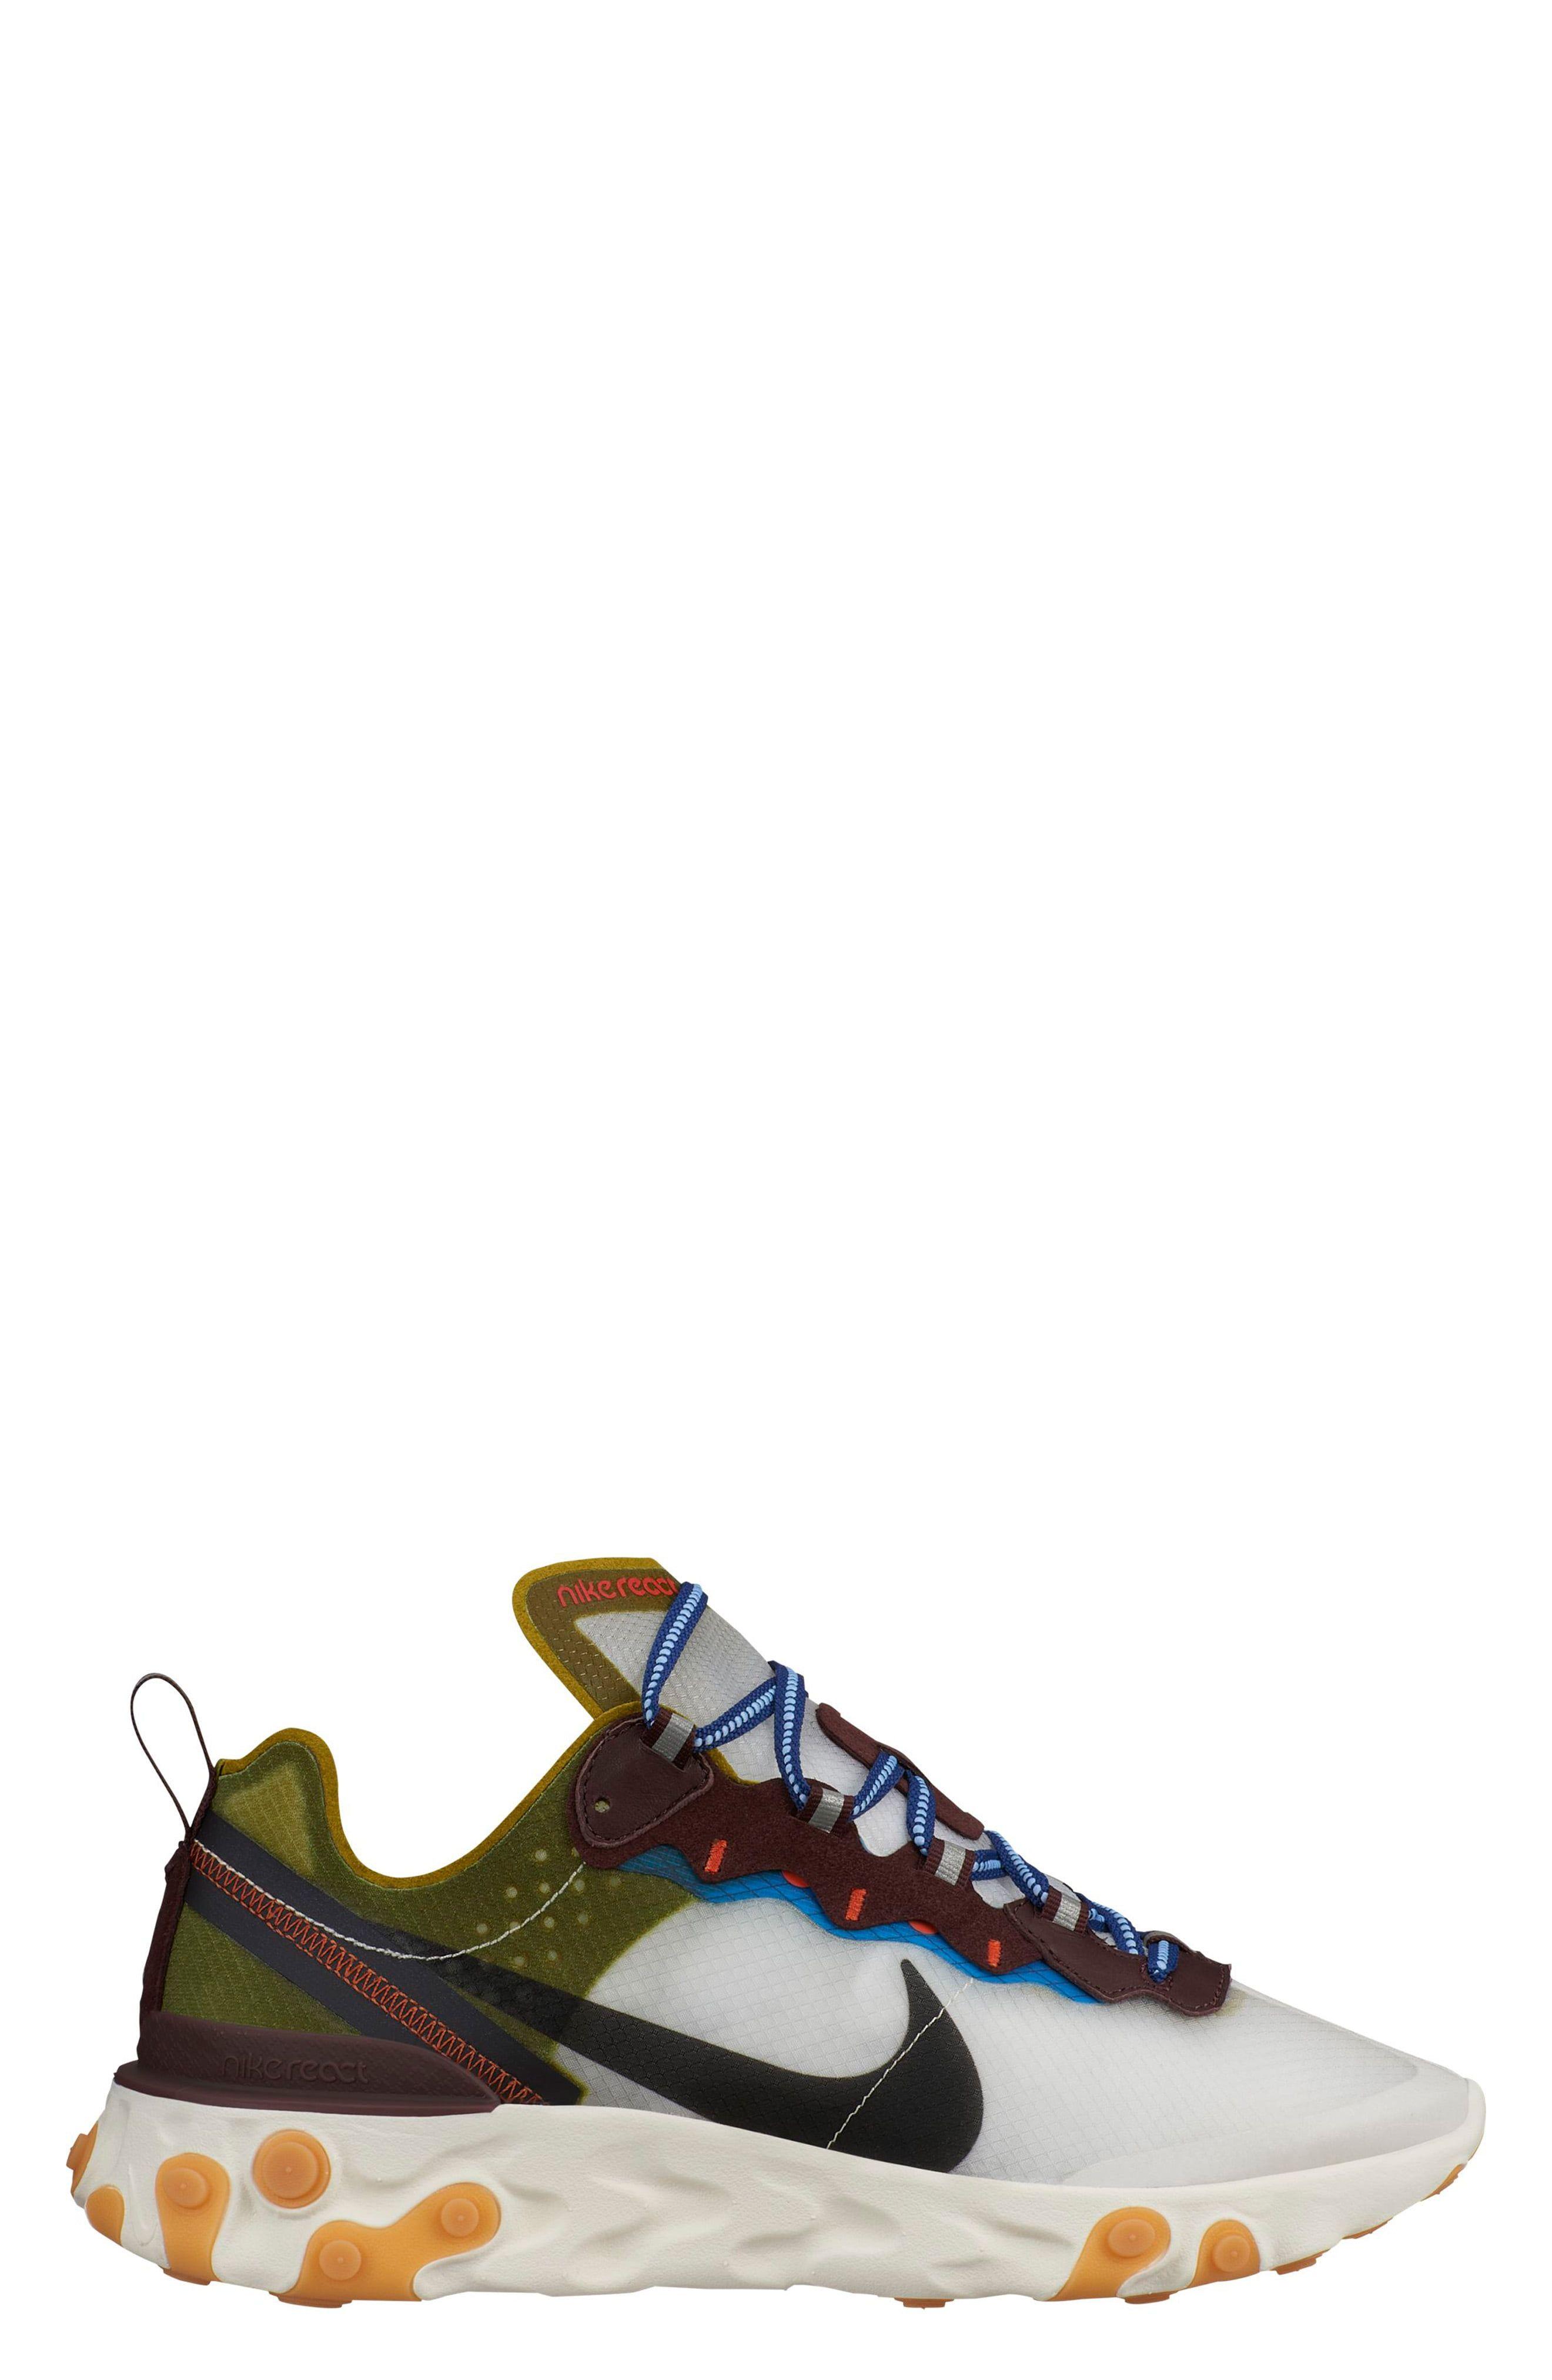 Nike React Element 87 Sneaker, Size 12